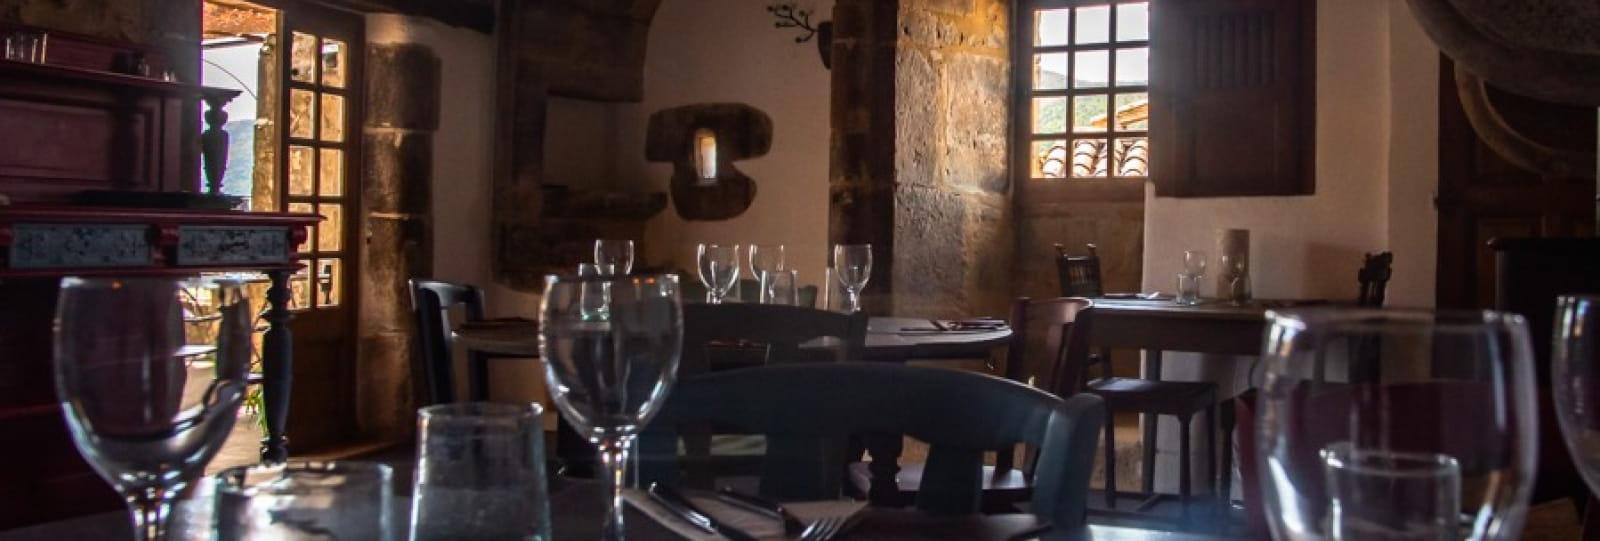 Restaurant Poet laval